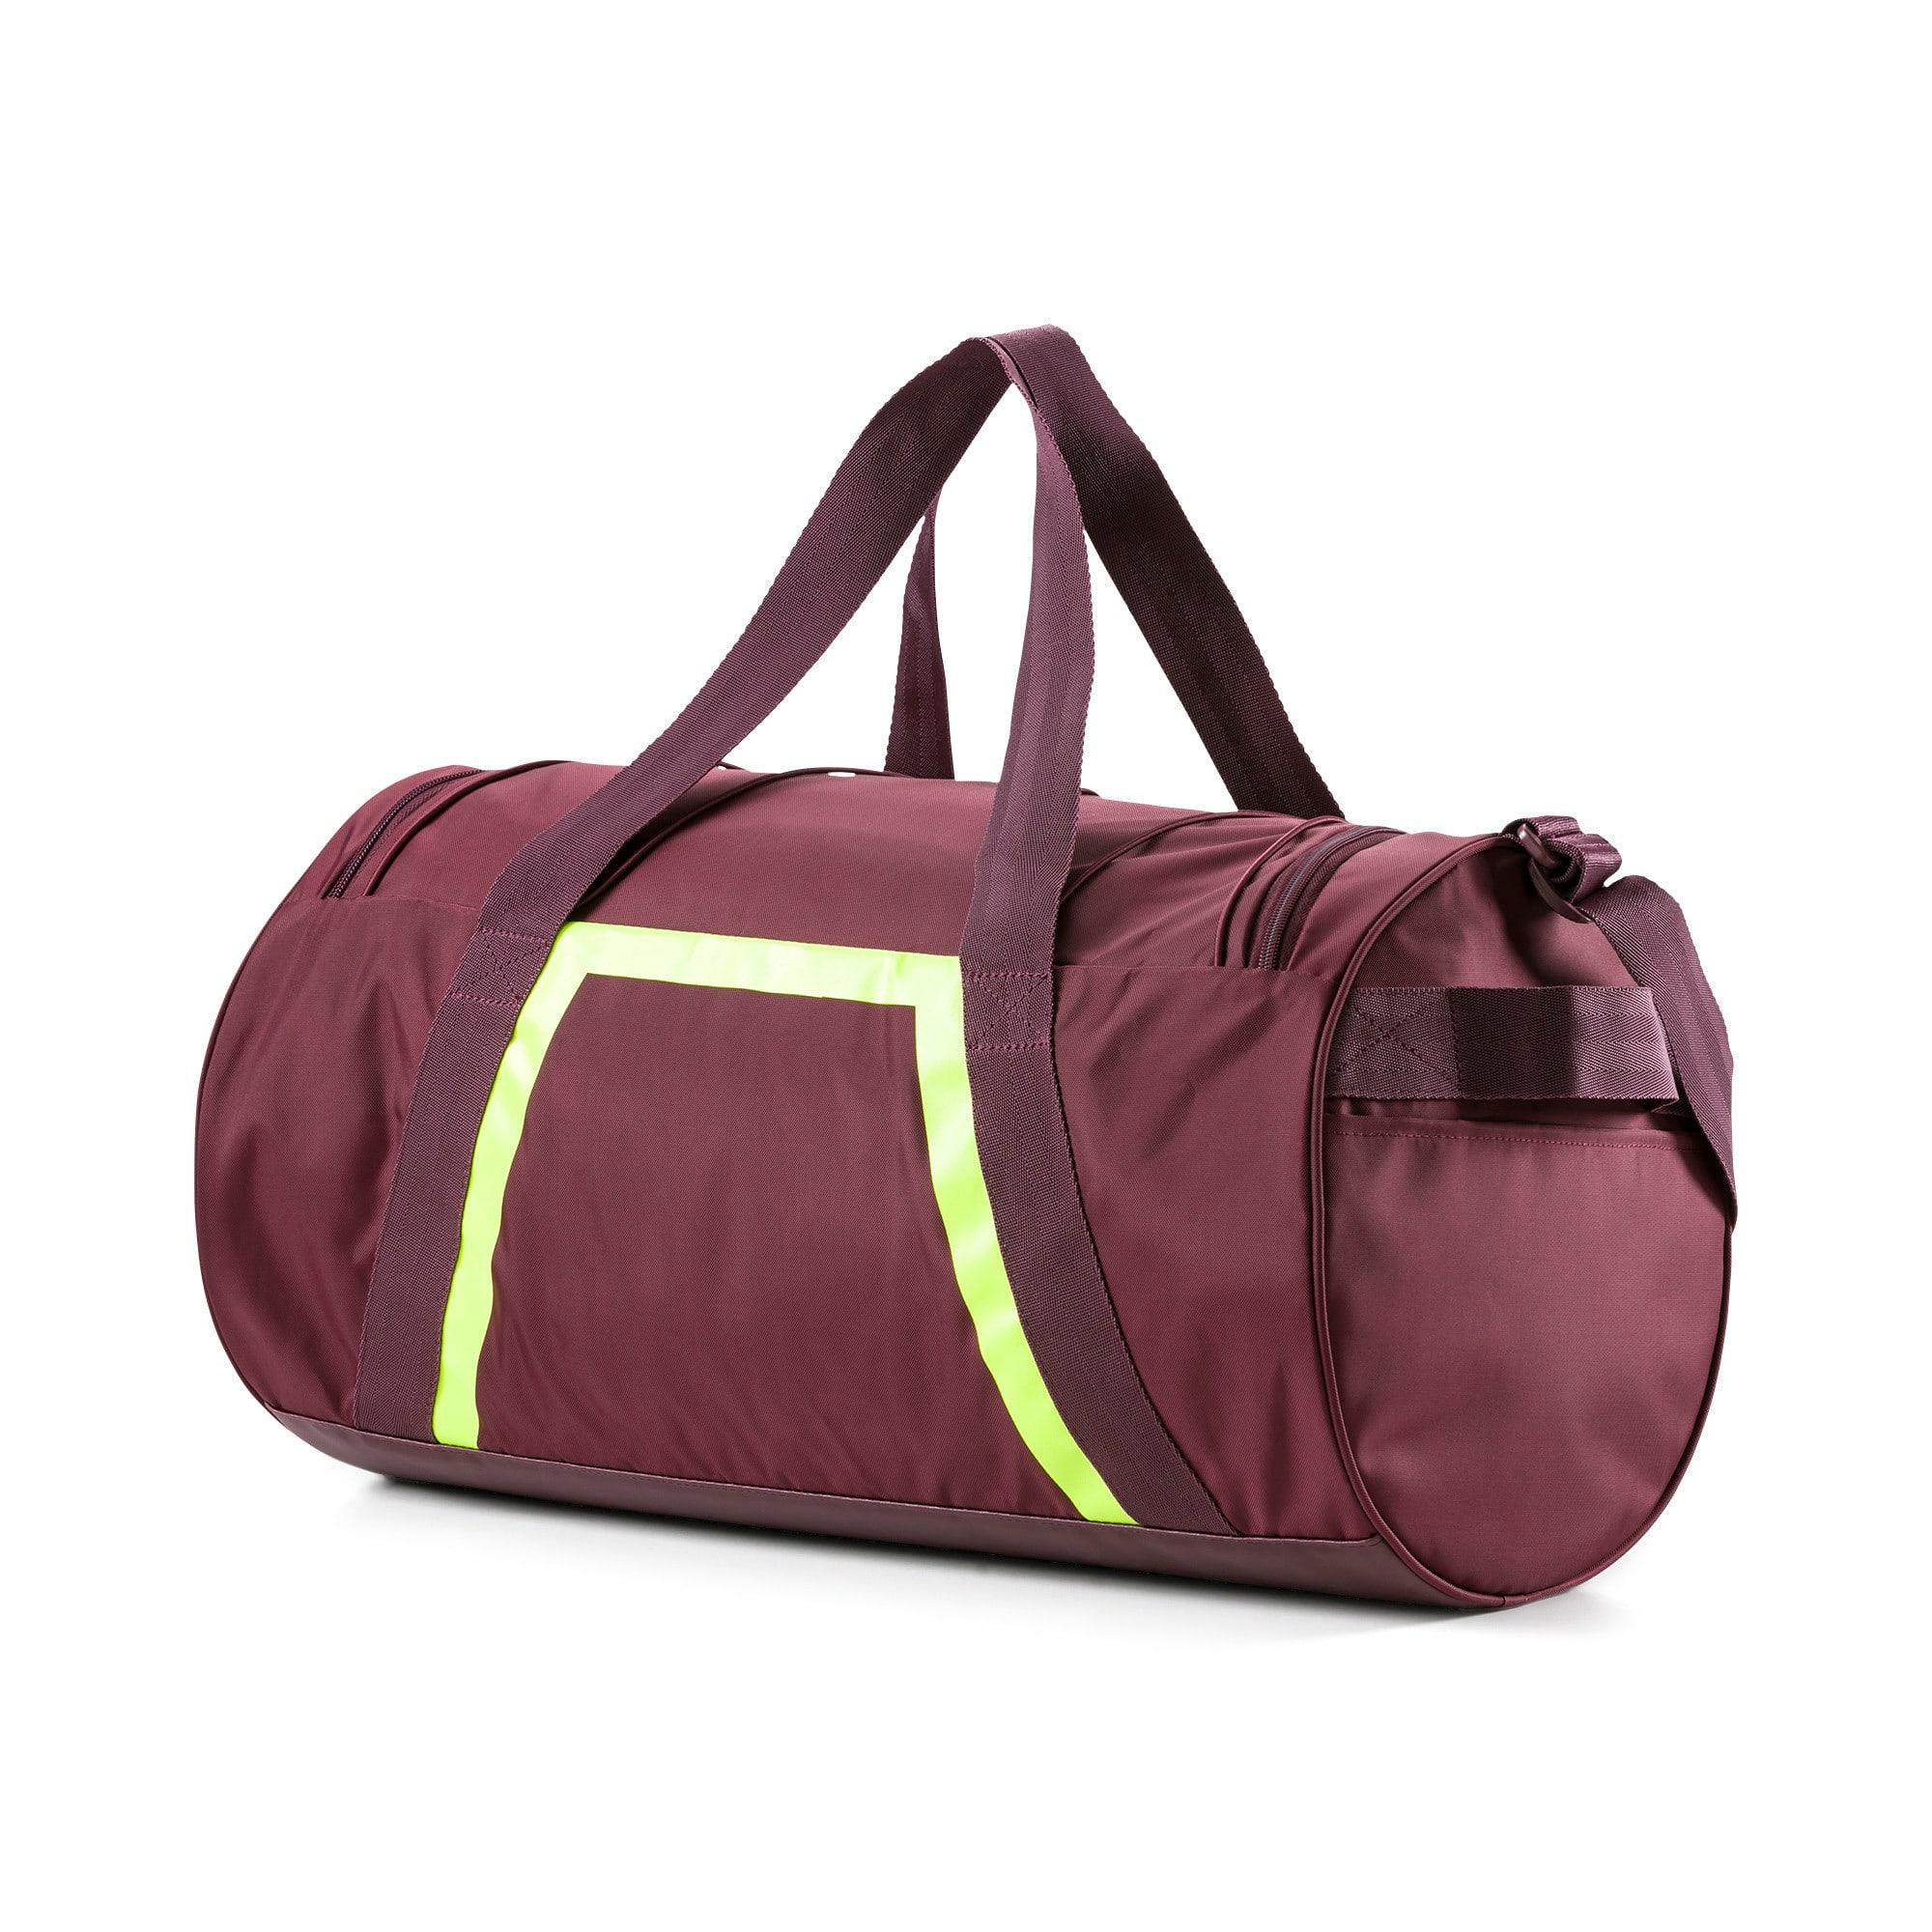 Thumbnail 3 of Active Training Shift Women's Duffel Bag, Vineyard Wine-Yellow Alert, medium-IND